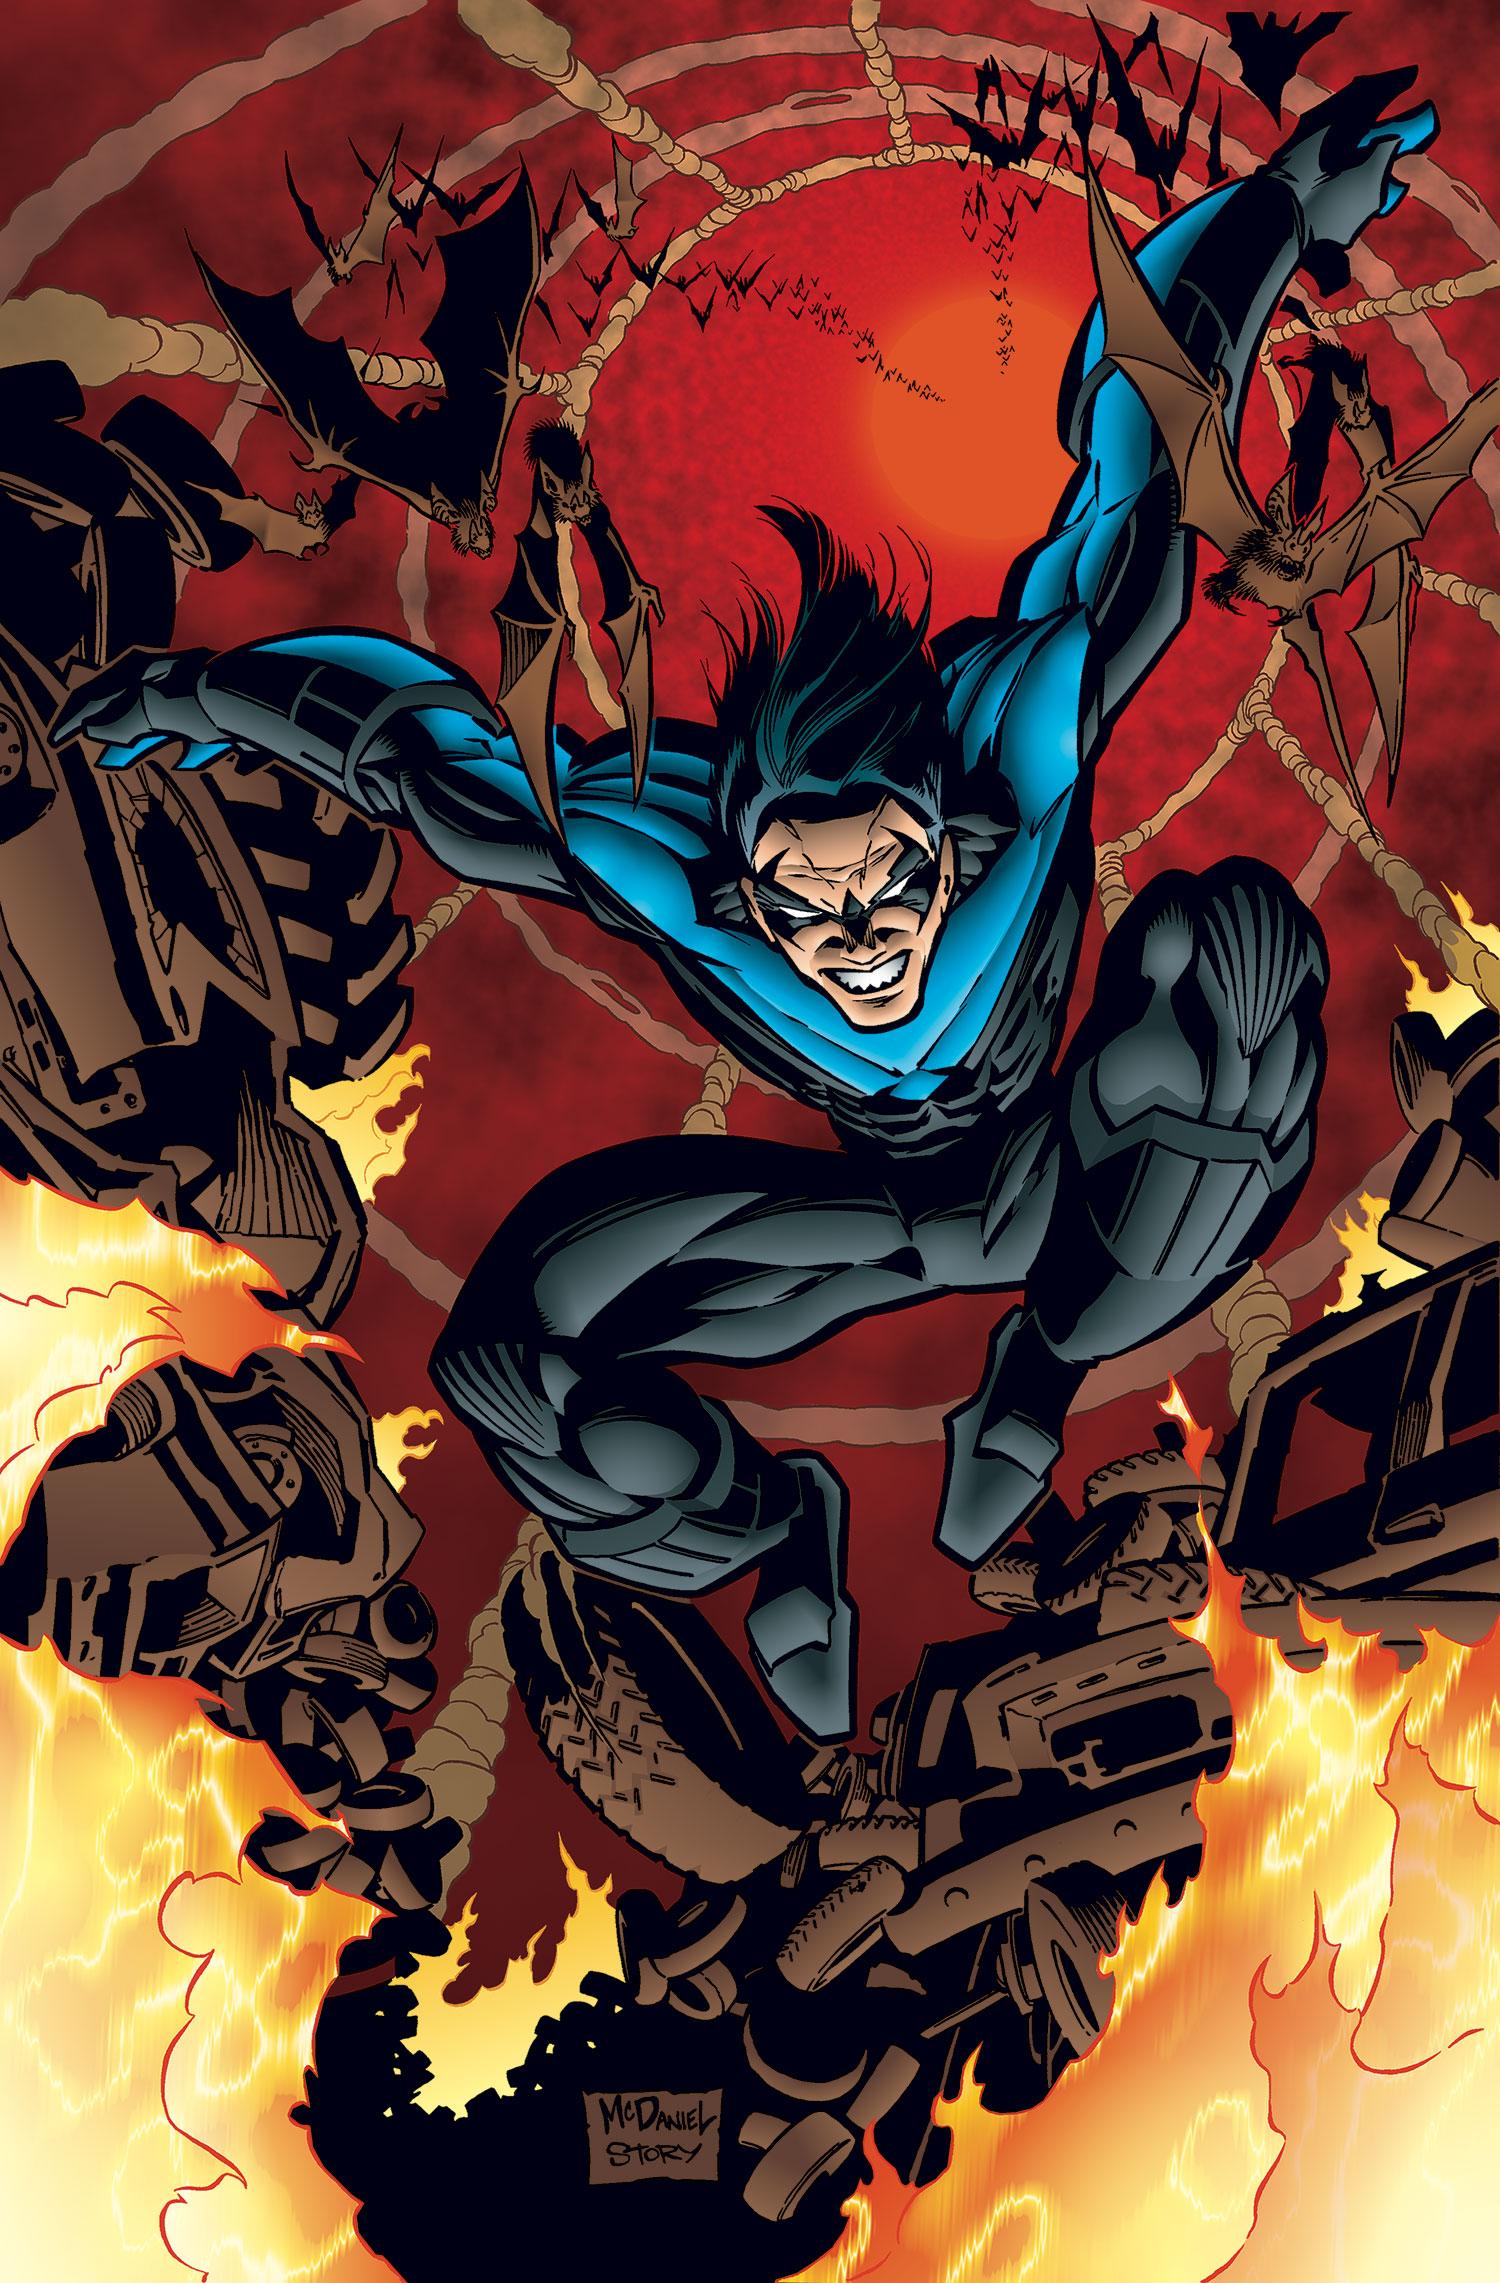 Nightwing Vol 2 12 Textless.jpg